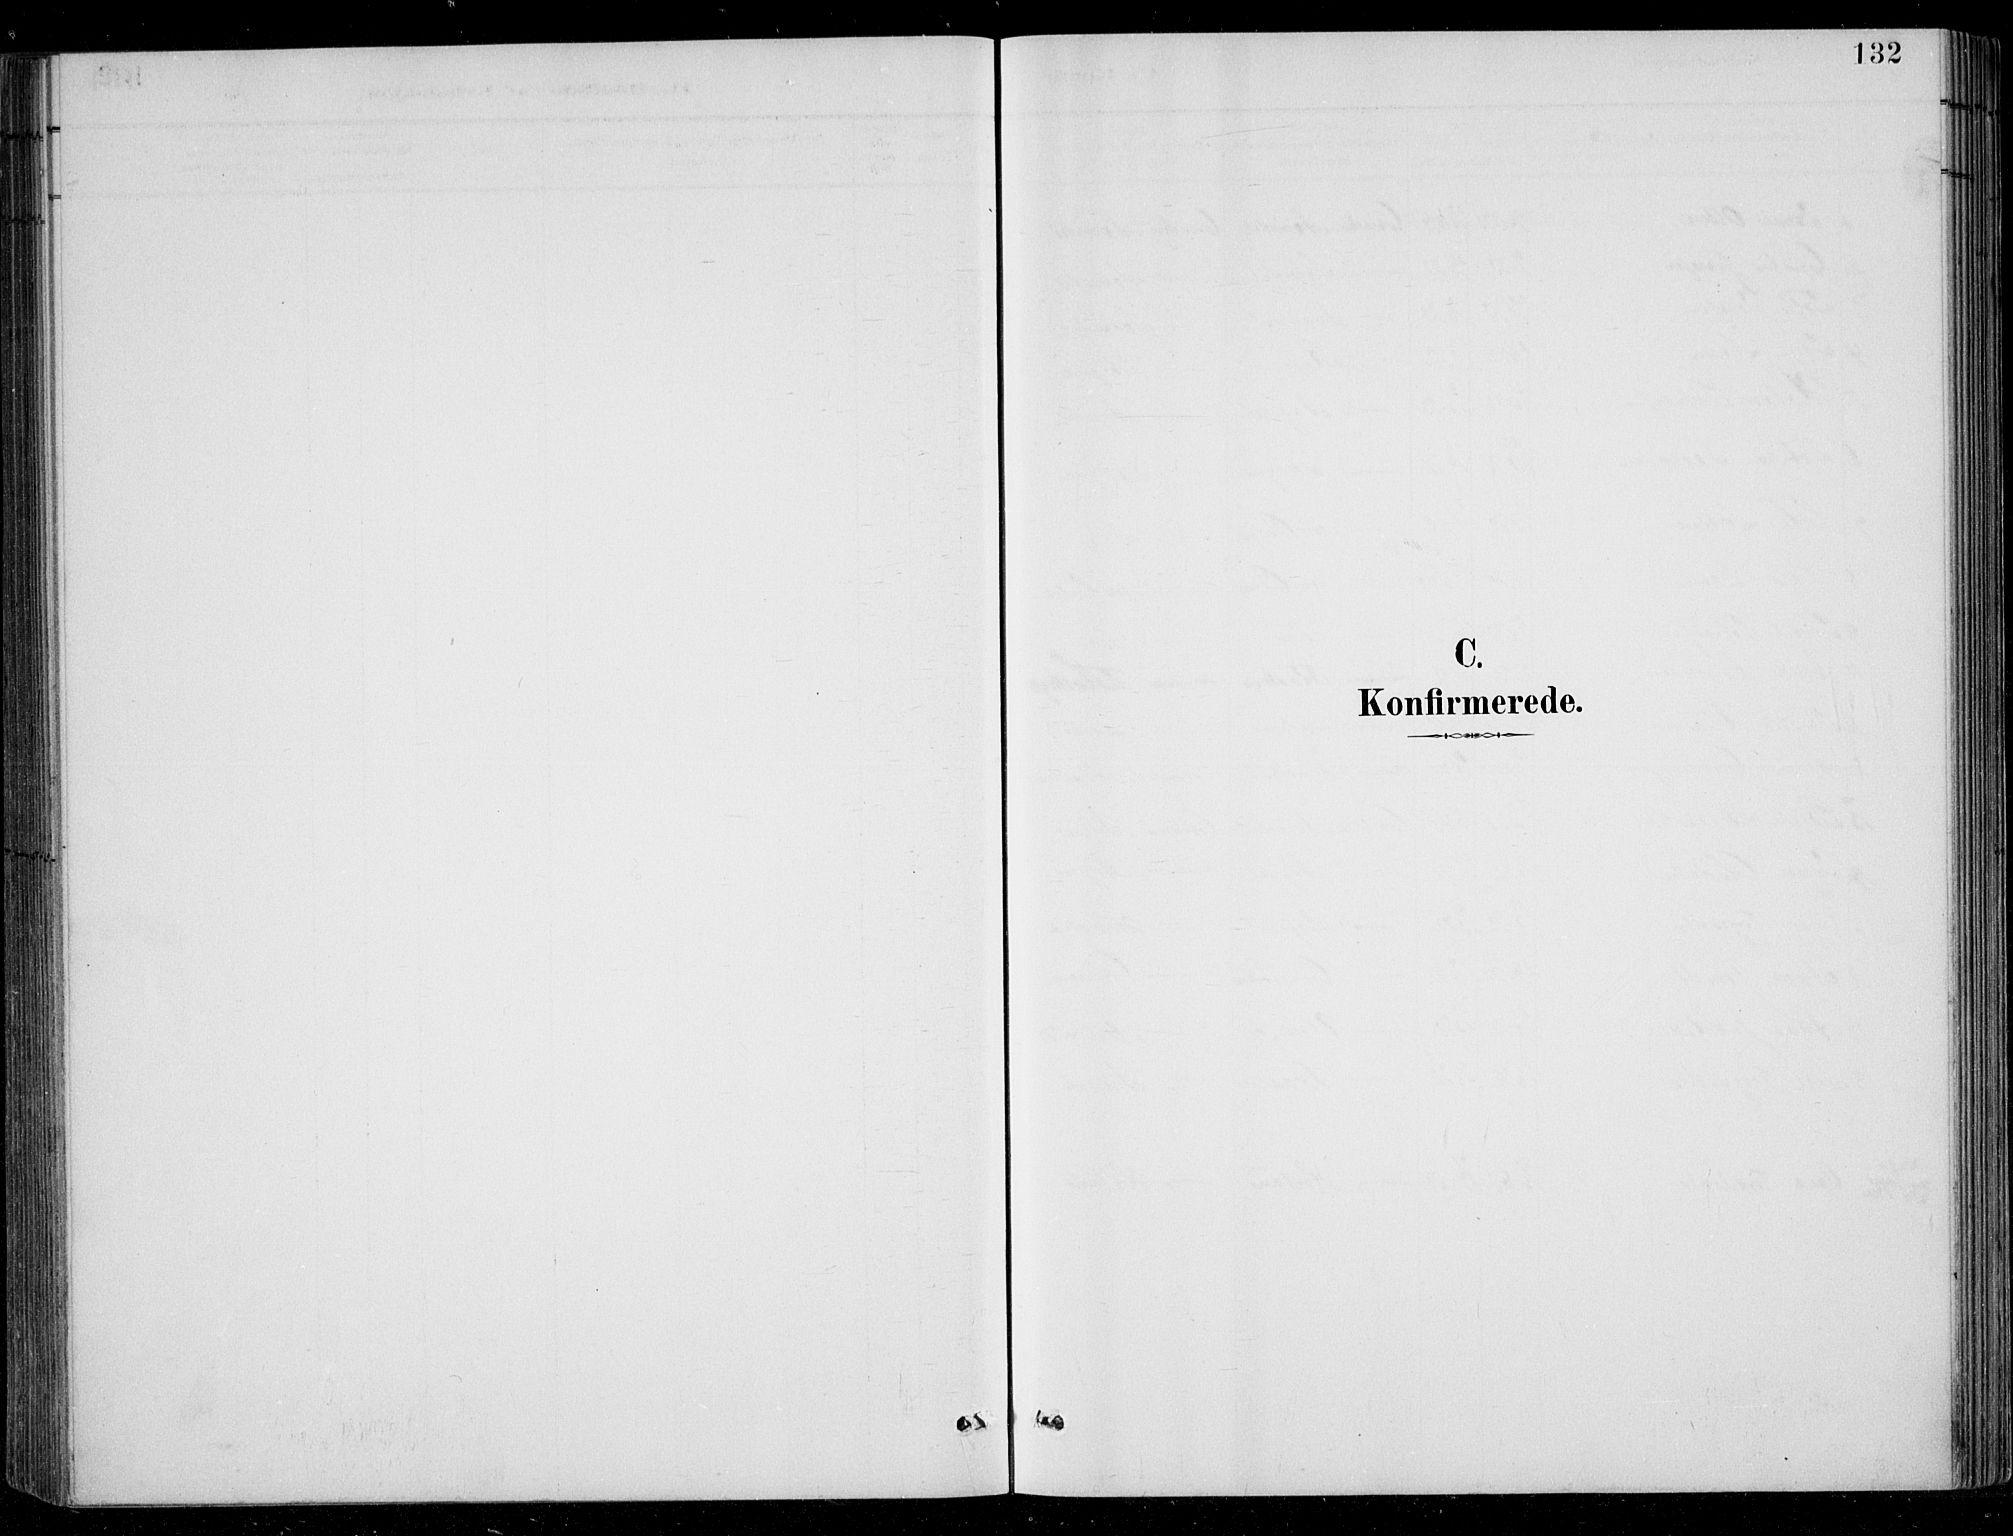 SAK, Bjelland sokneprestkontor, F/Fb/Fbc/L0003: Klokkerbok nr. B 3, 1887-1924, s. 132